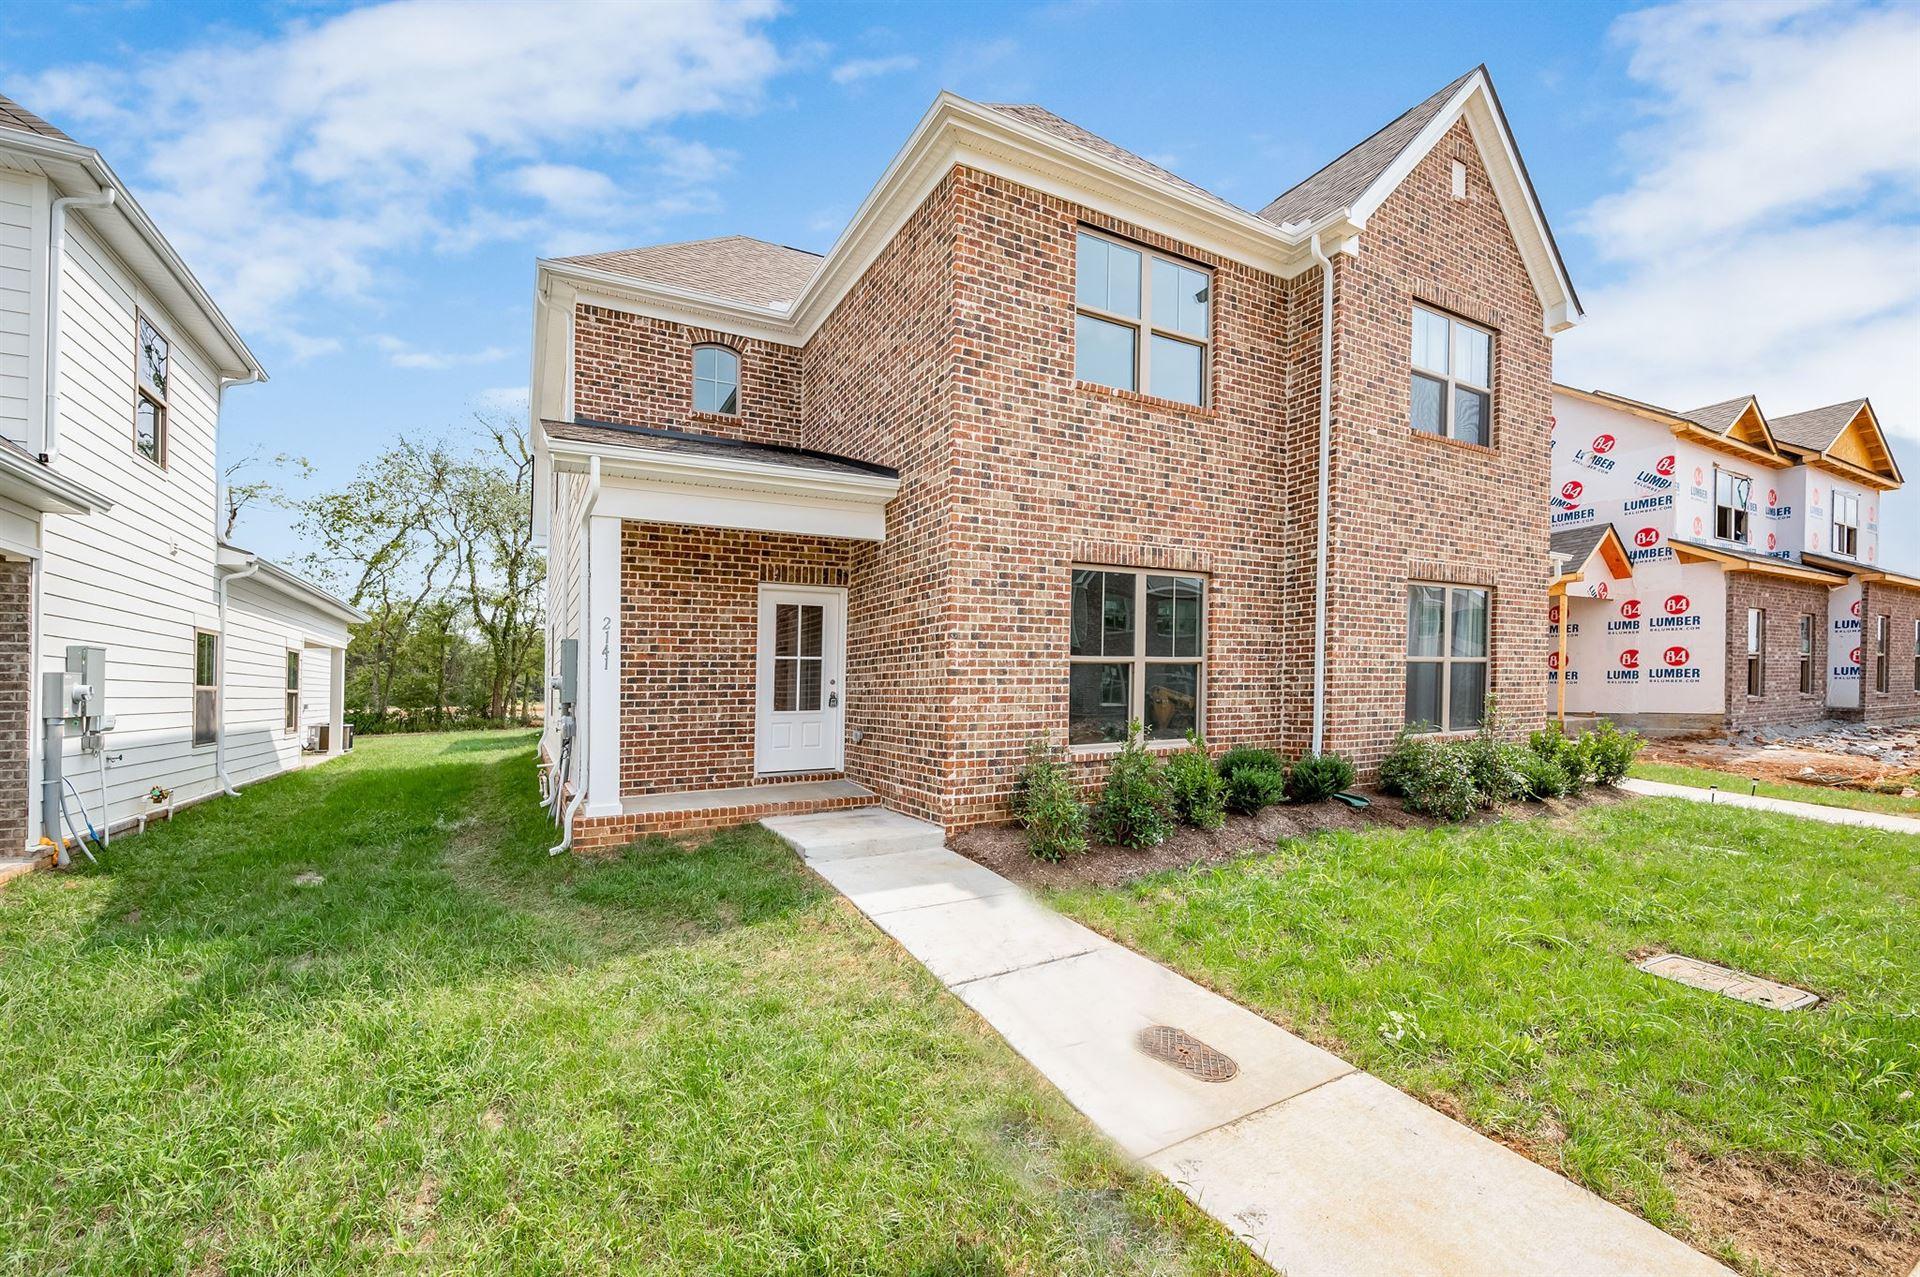 Photo of 2141 Hospitality Ln, Murfreesboro, TN 37128 (MLS # 2168351)